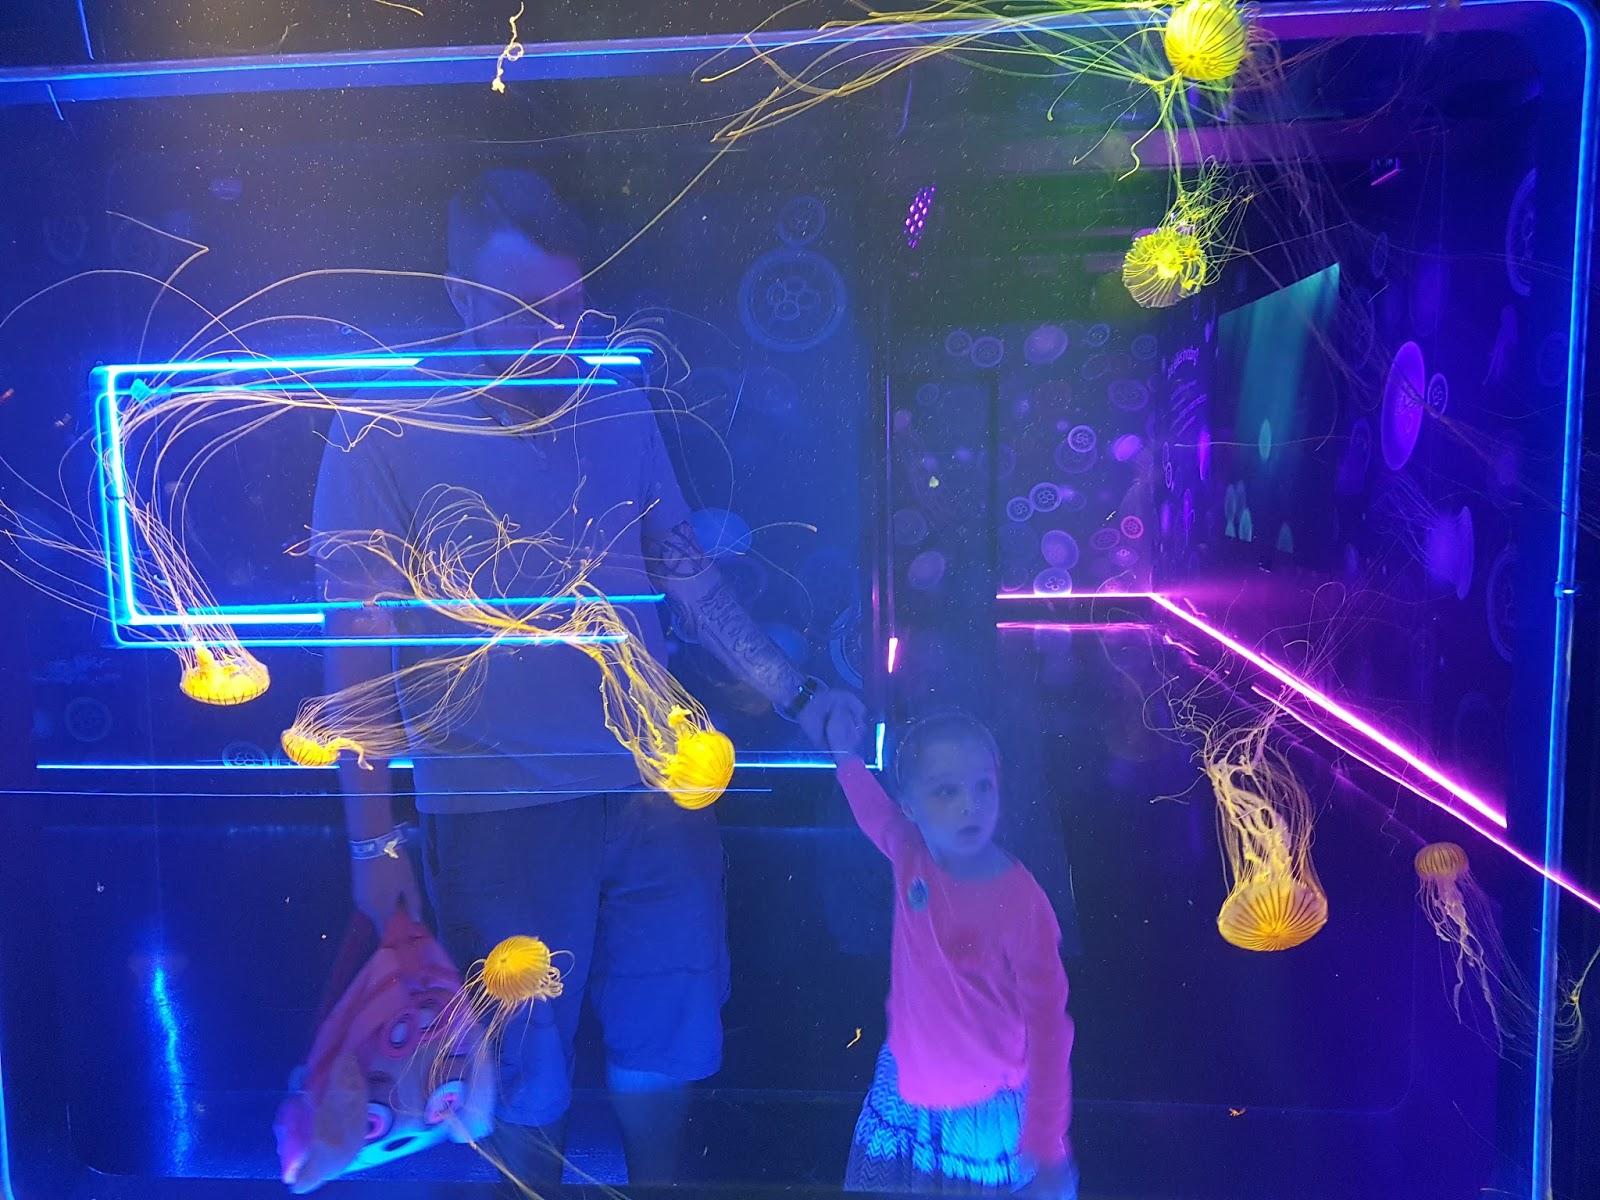 jellyfish wall at london aquarium ocean invaders jellyfish exhibition